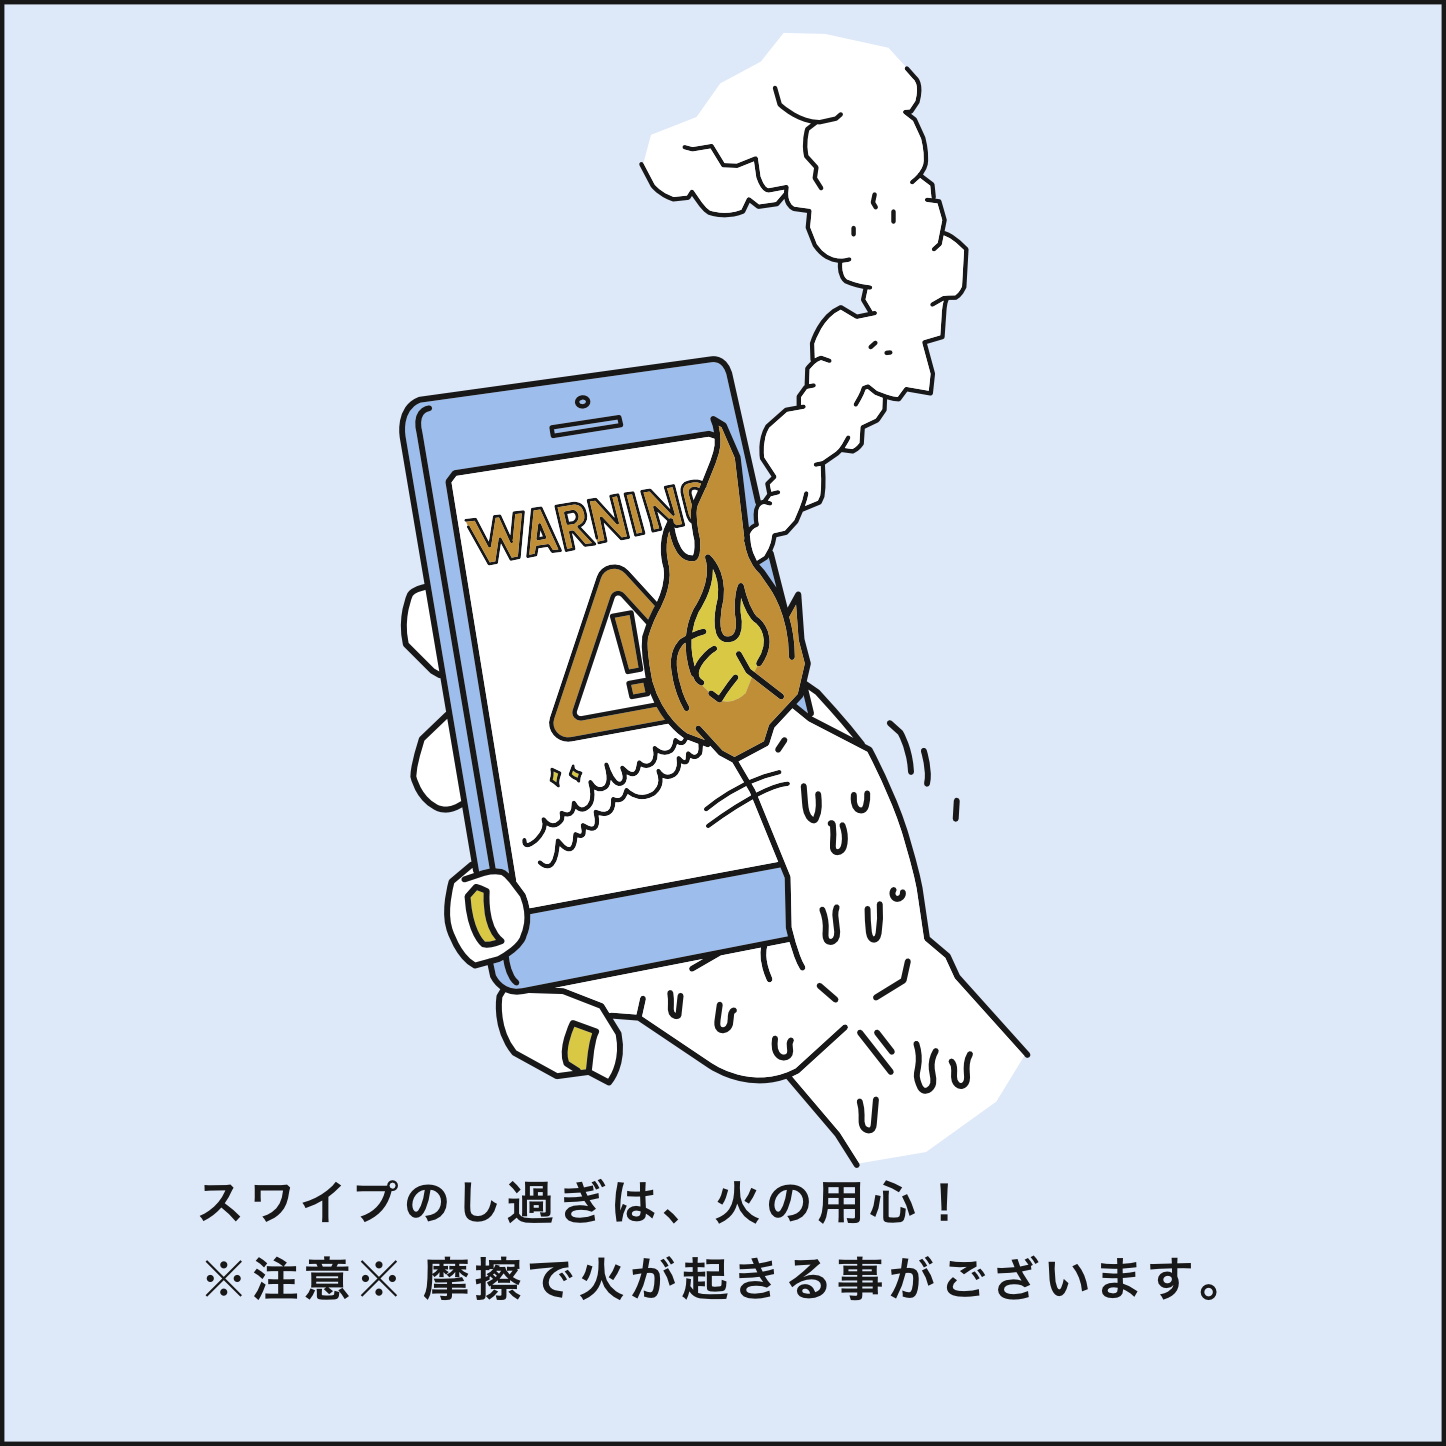 Future-of-Phones-Hangame-6.jpg